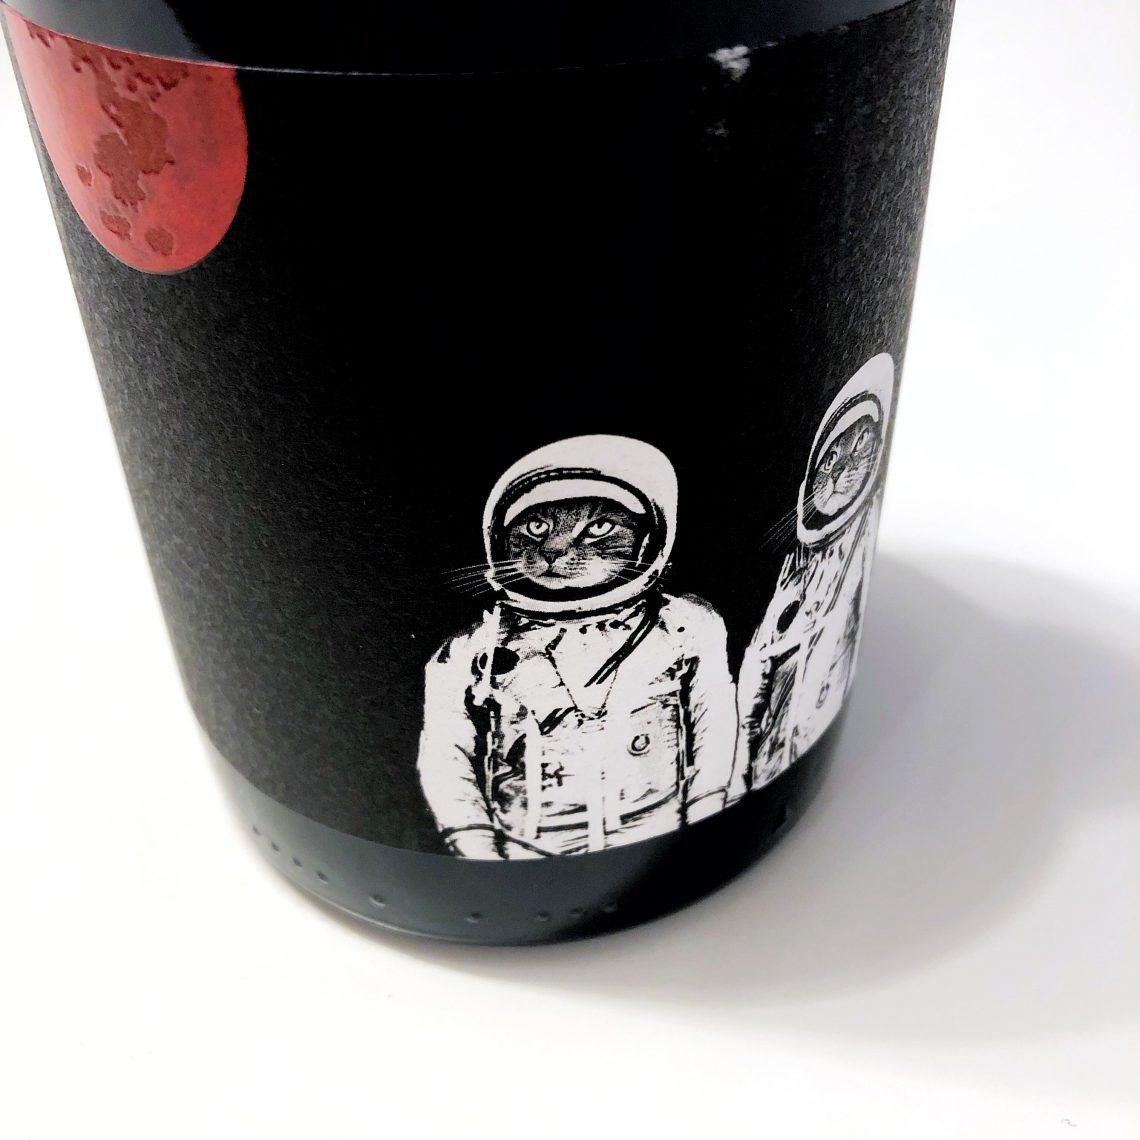 Felicette - Valentine's Day wine